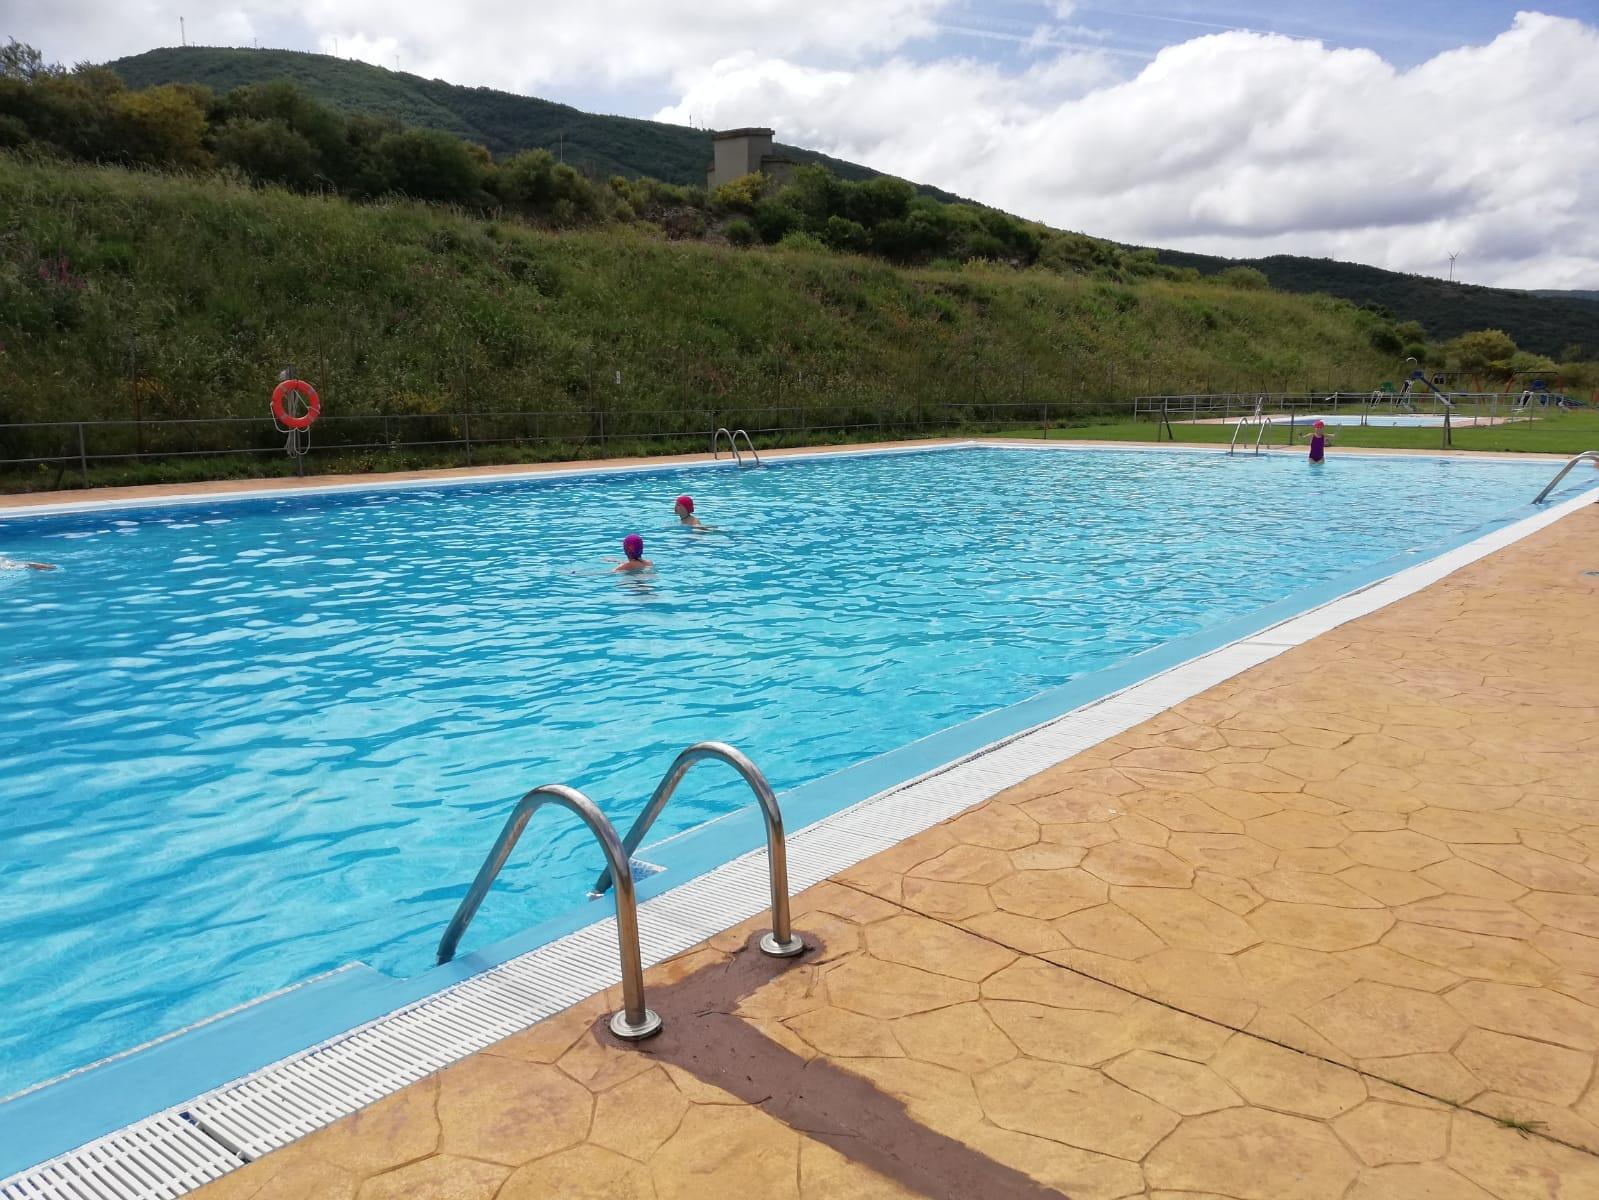 Campamento de verano multiaventura con piscina